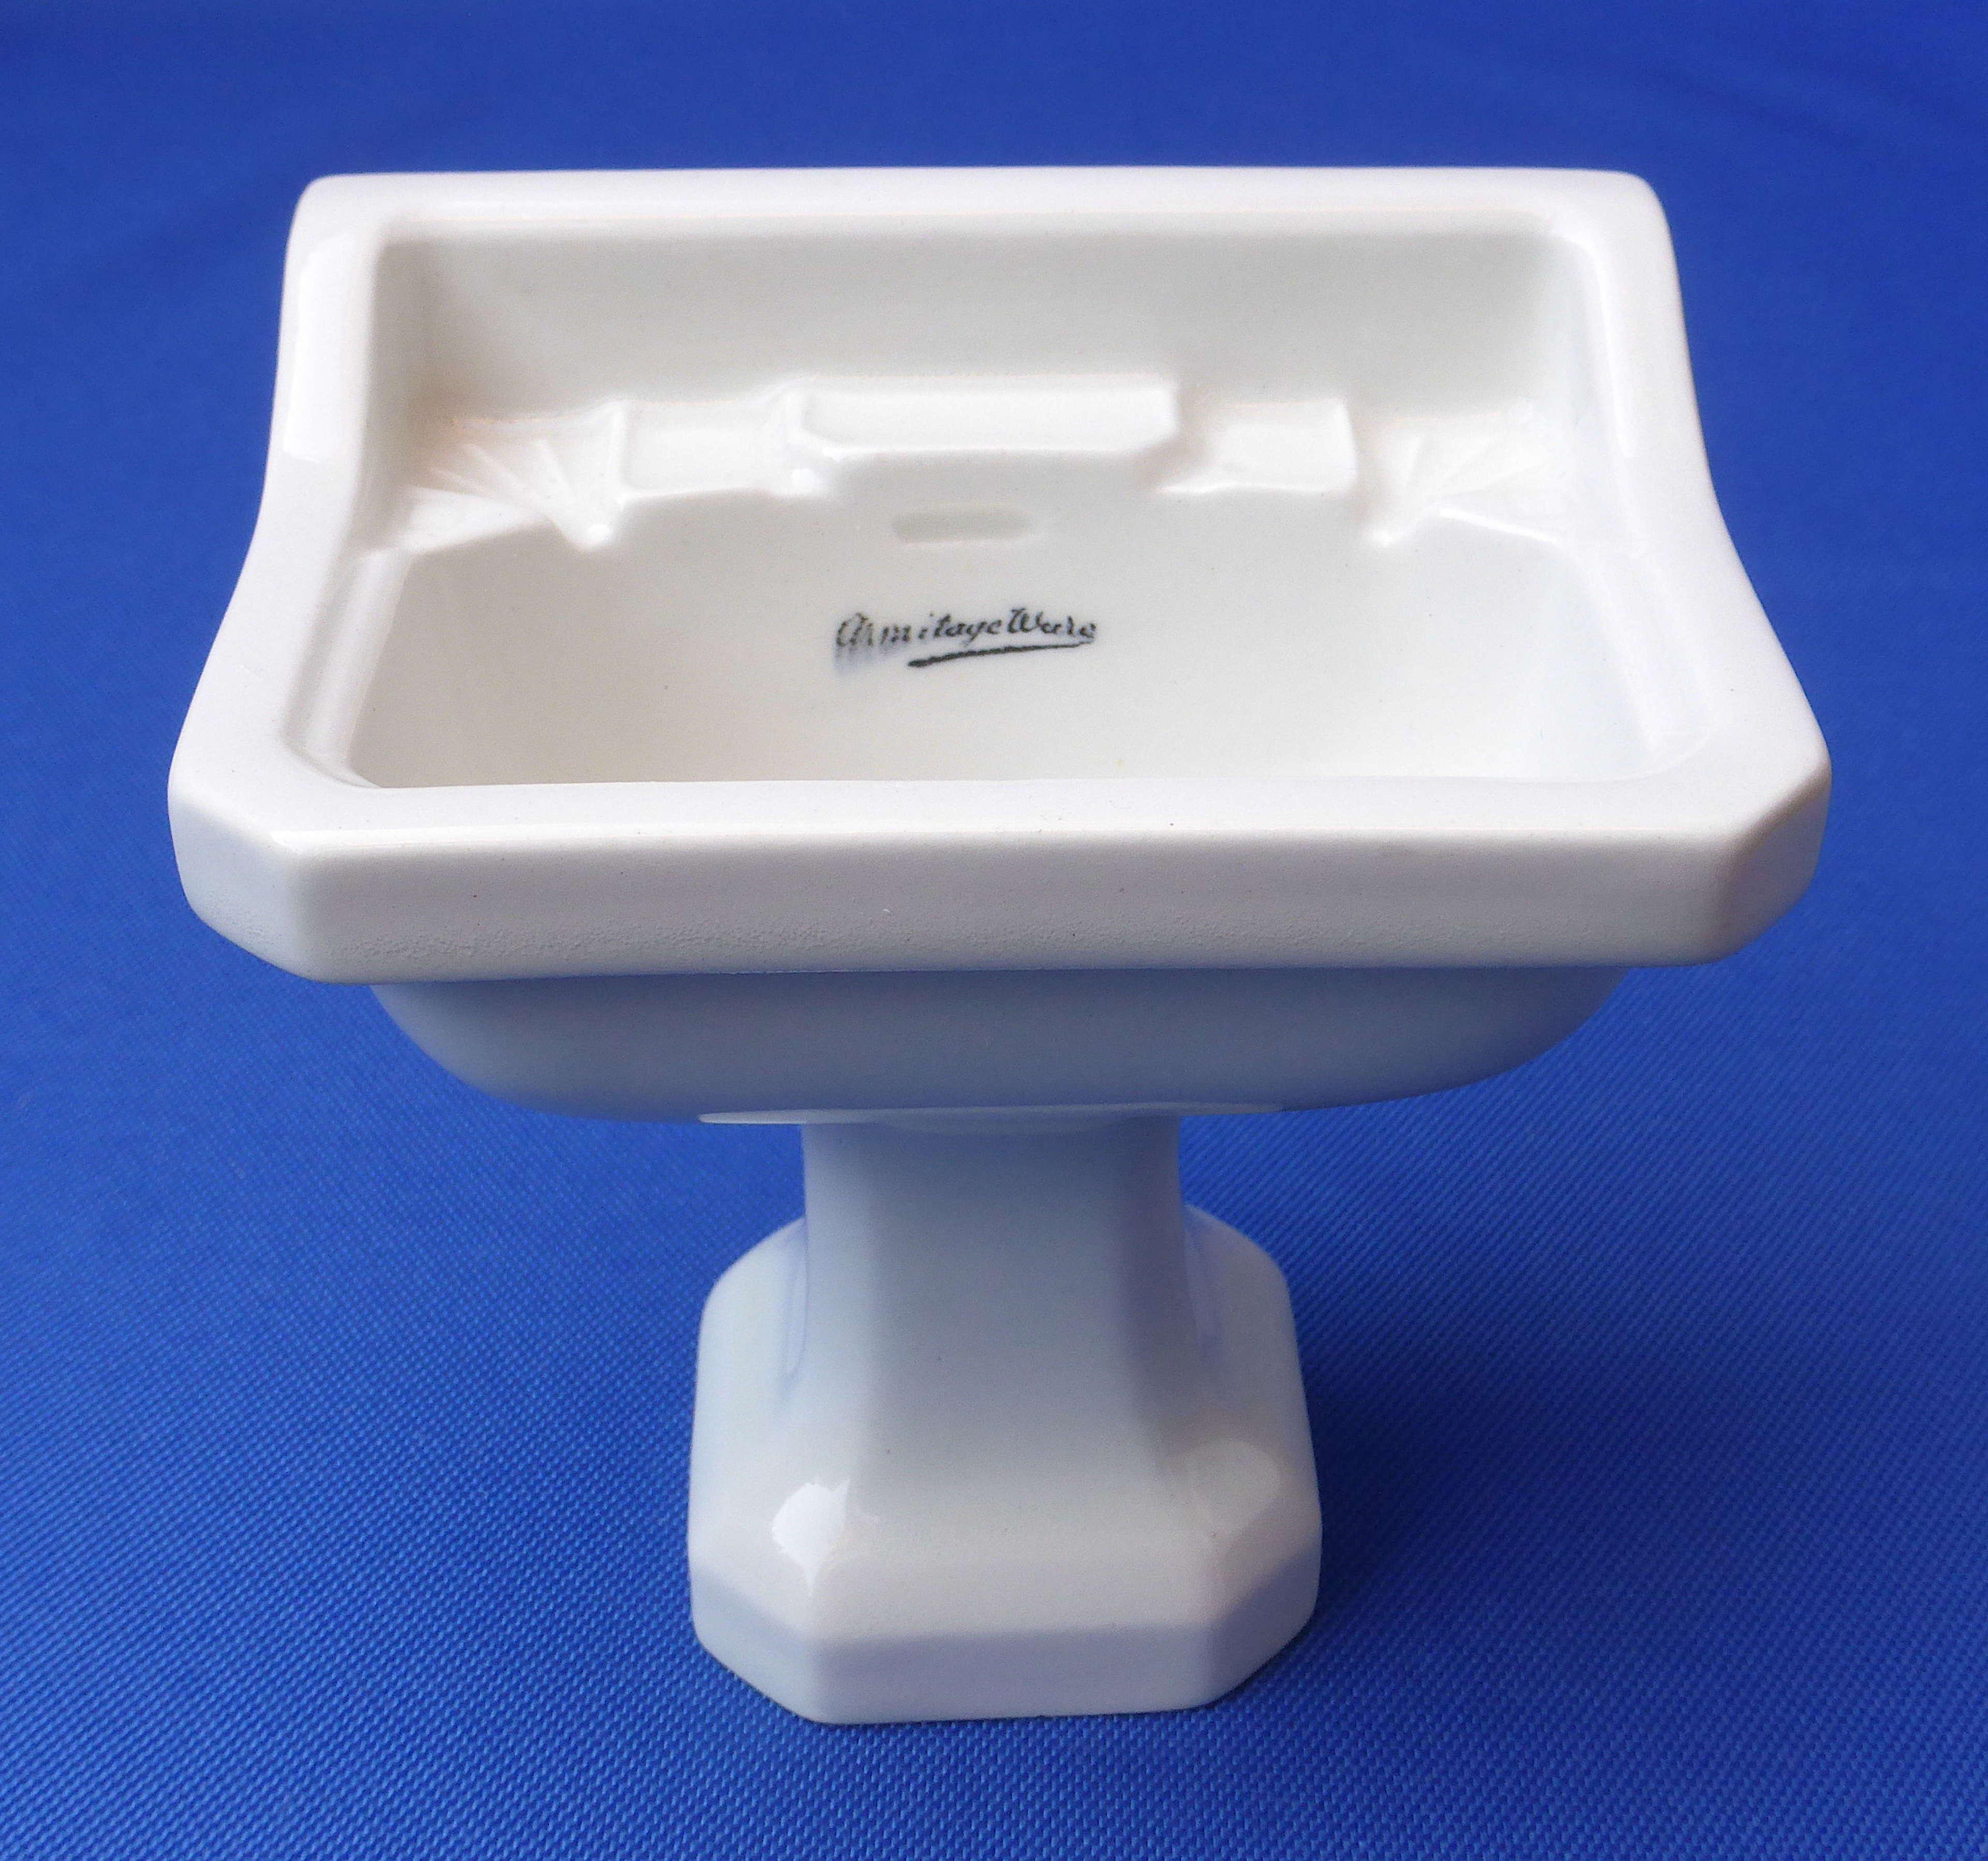 Miniature Armitage salesman's sample sink early 20th century